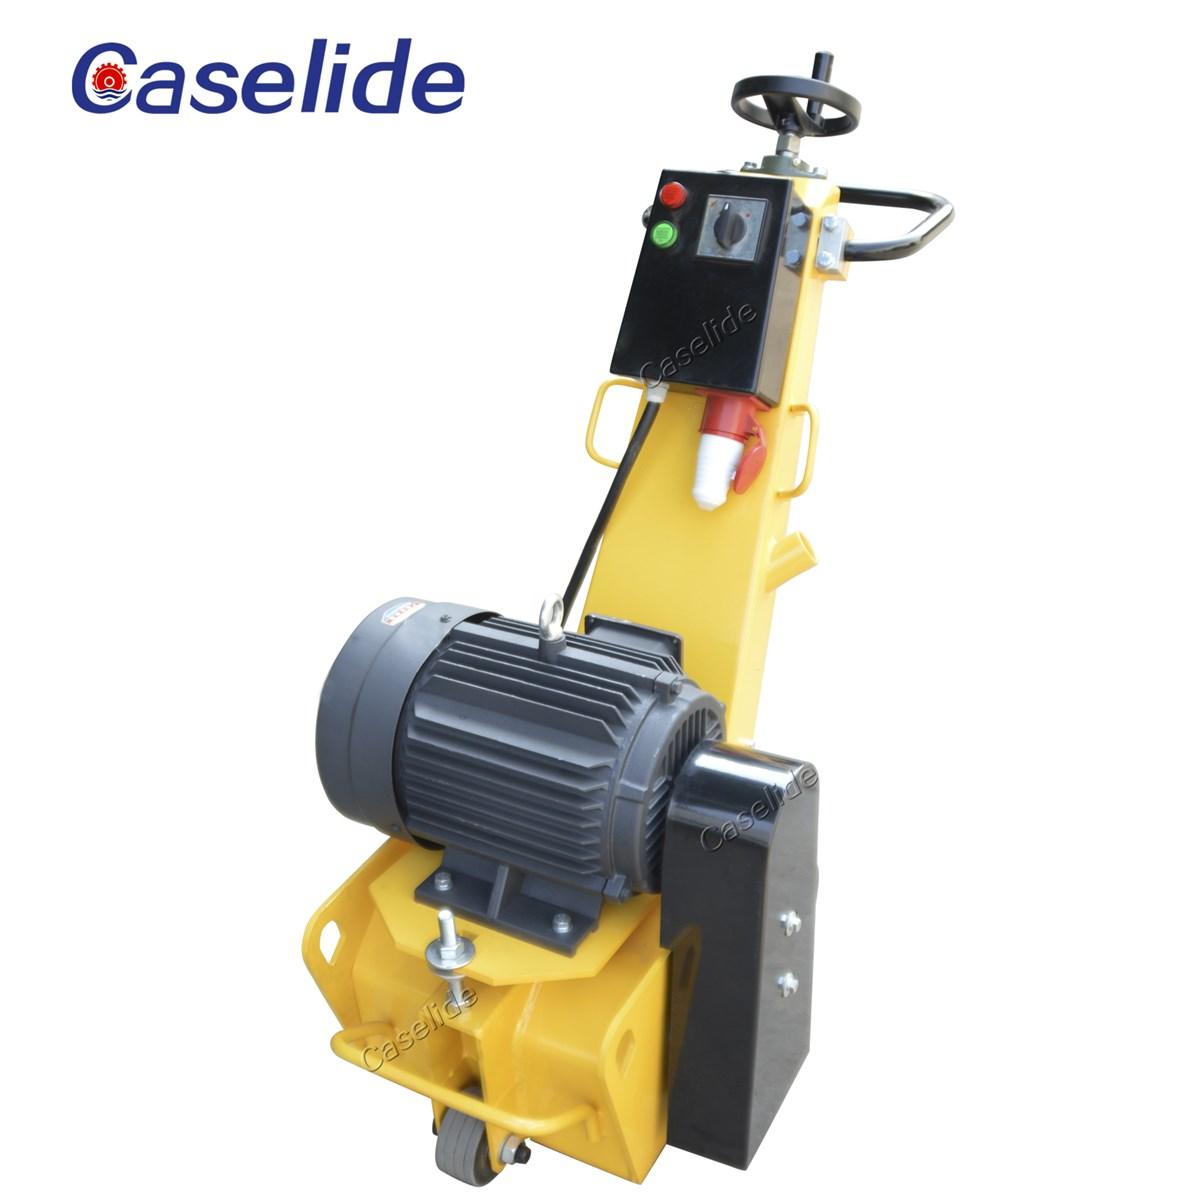 small road milling machine Concrete Floor Milling Floor Scarifier